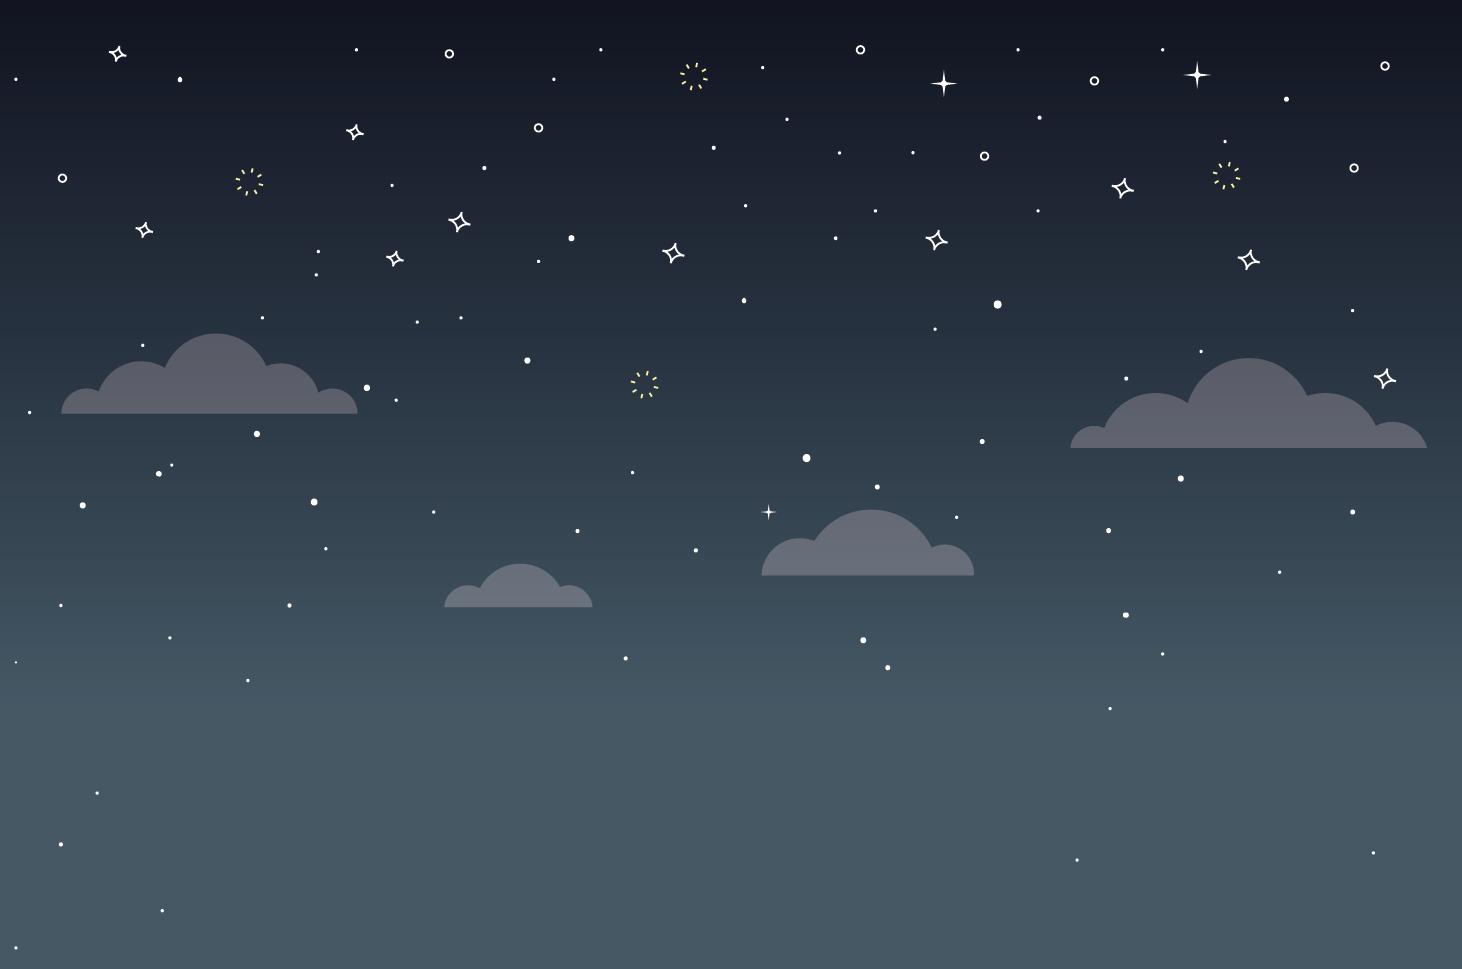 insomnia bisa buat borderline personality disorder makin parah